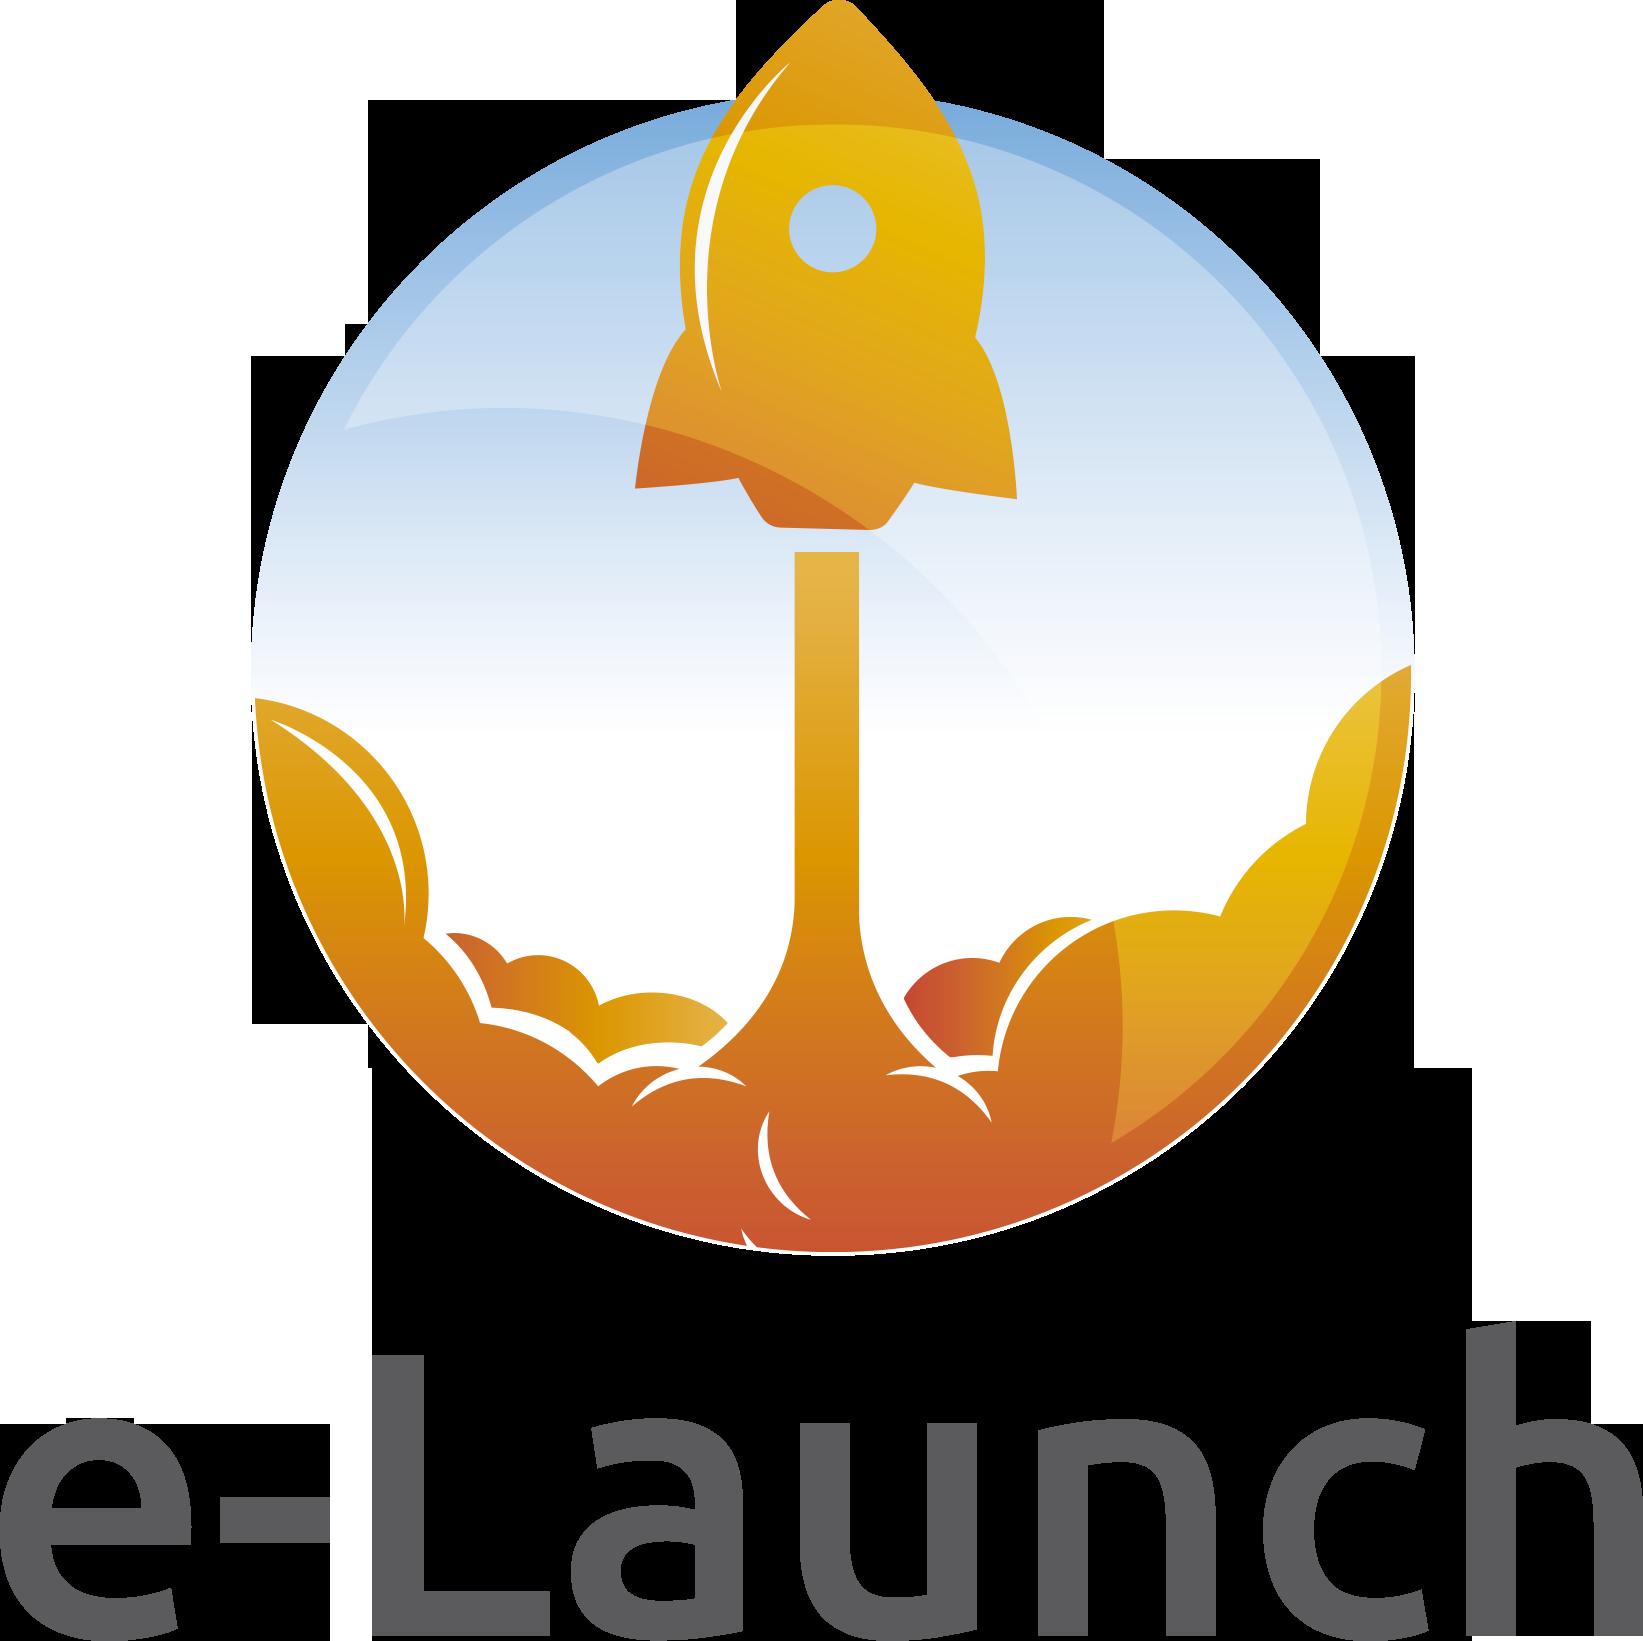 E-launch Marketing Digital